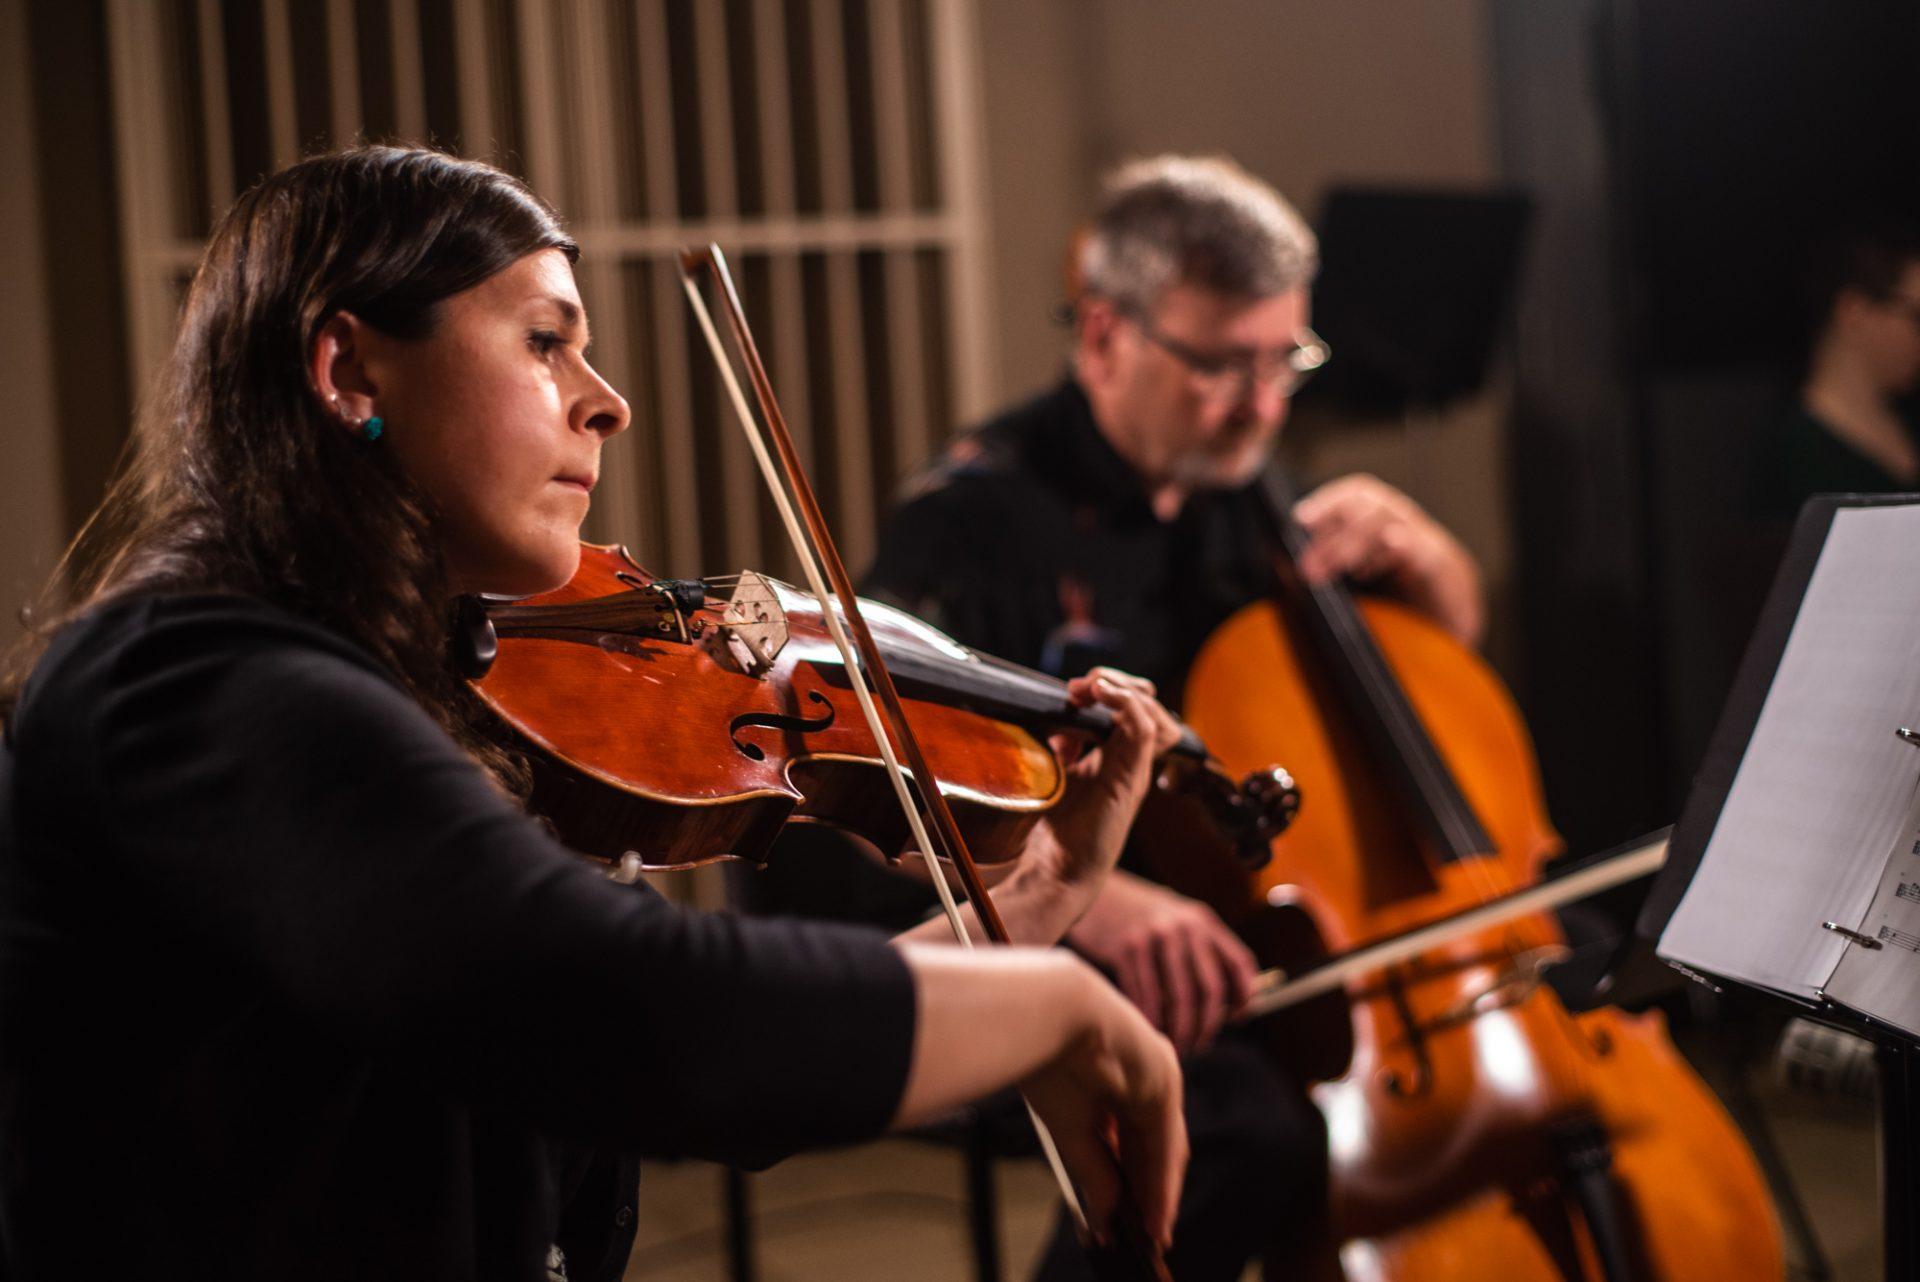 Marie Valigorsky performing